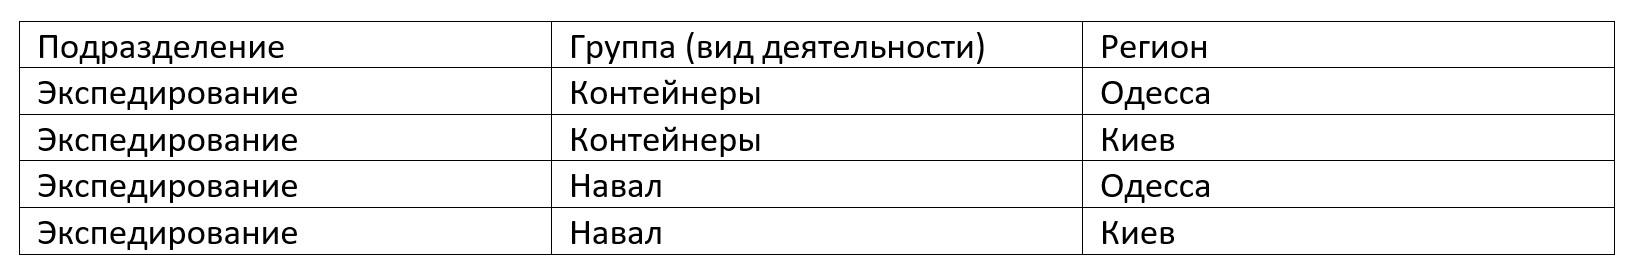 матрица профит-центров